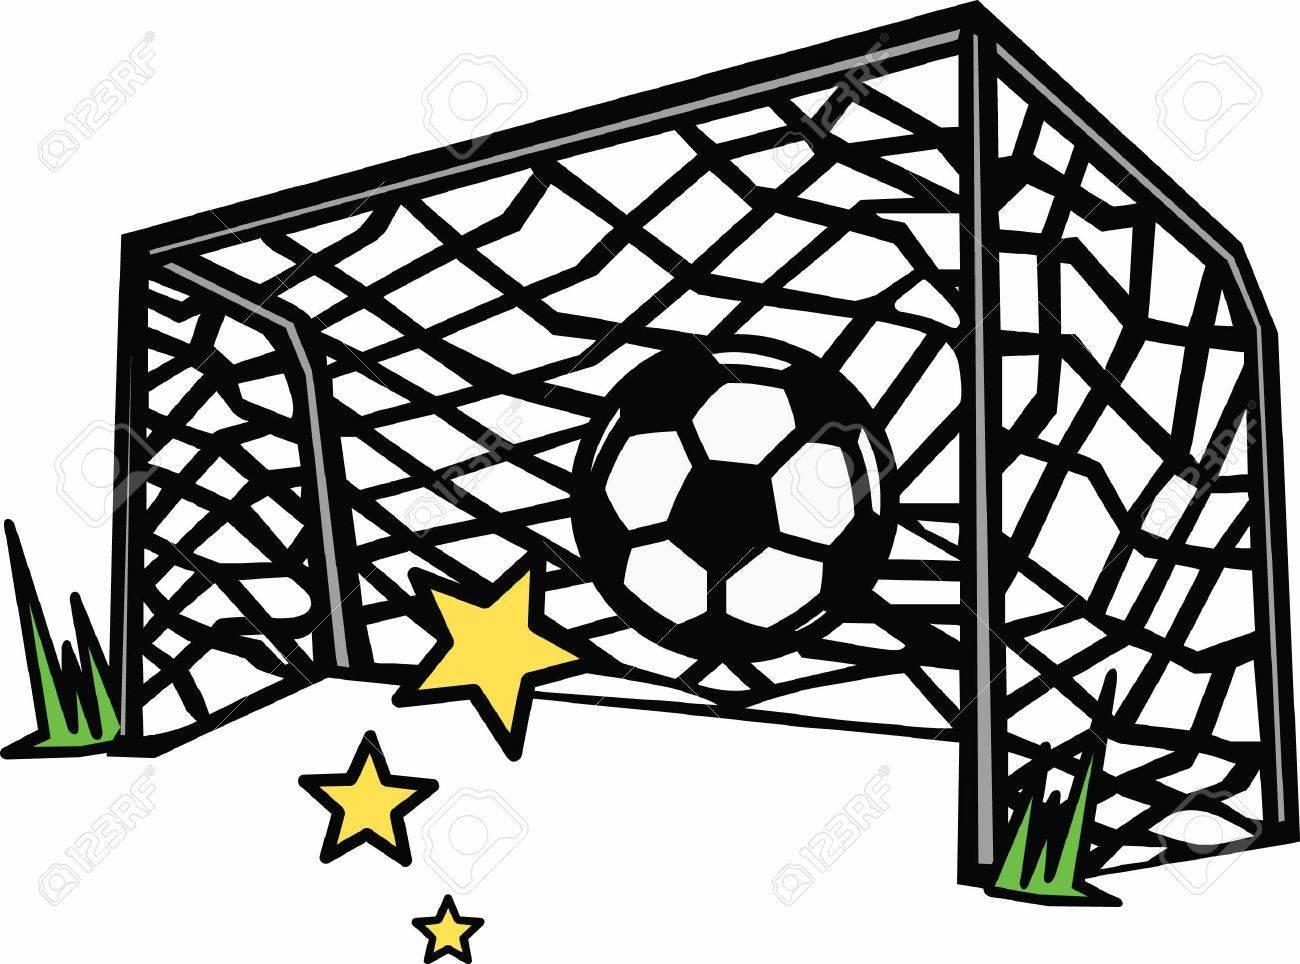 Score a goal clipart 3 » Clipart Portal.